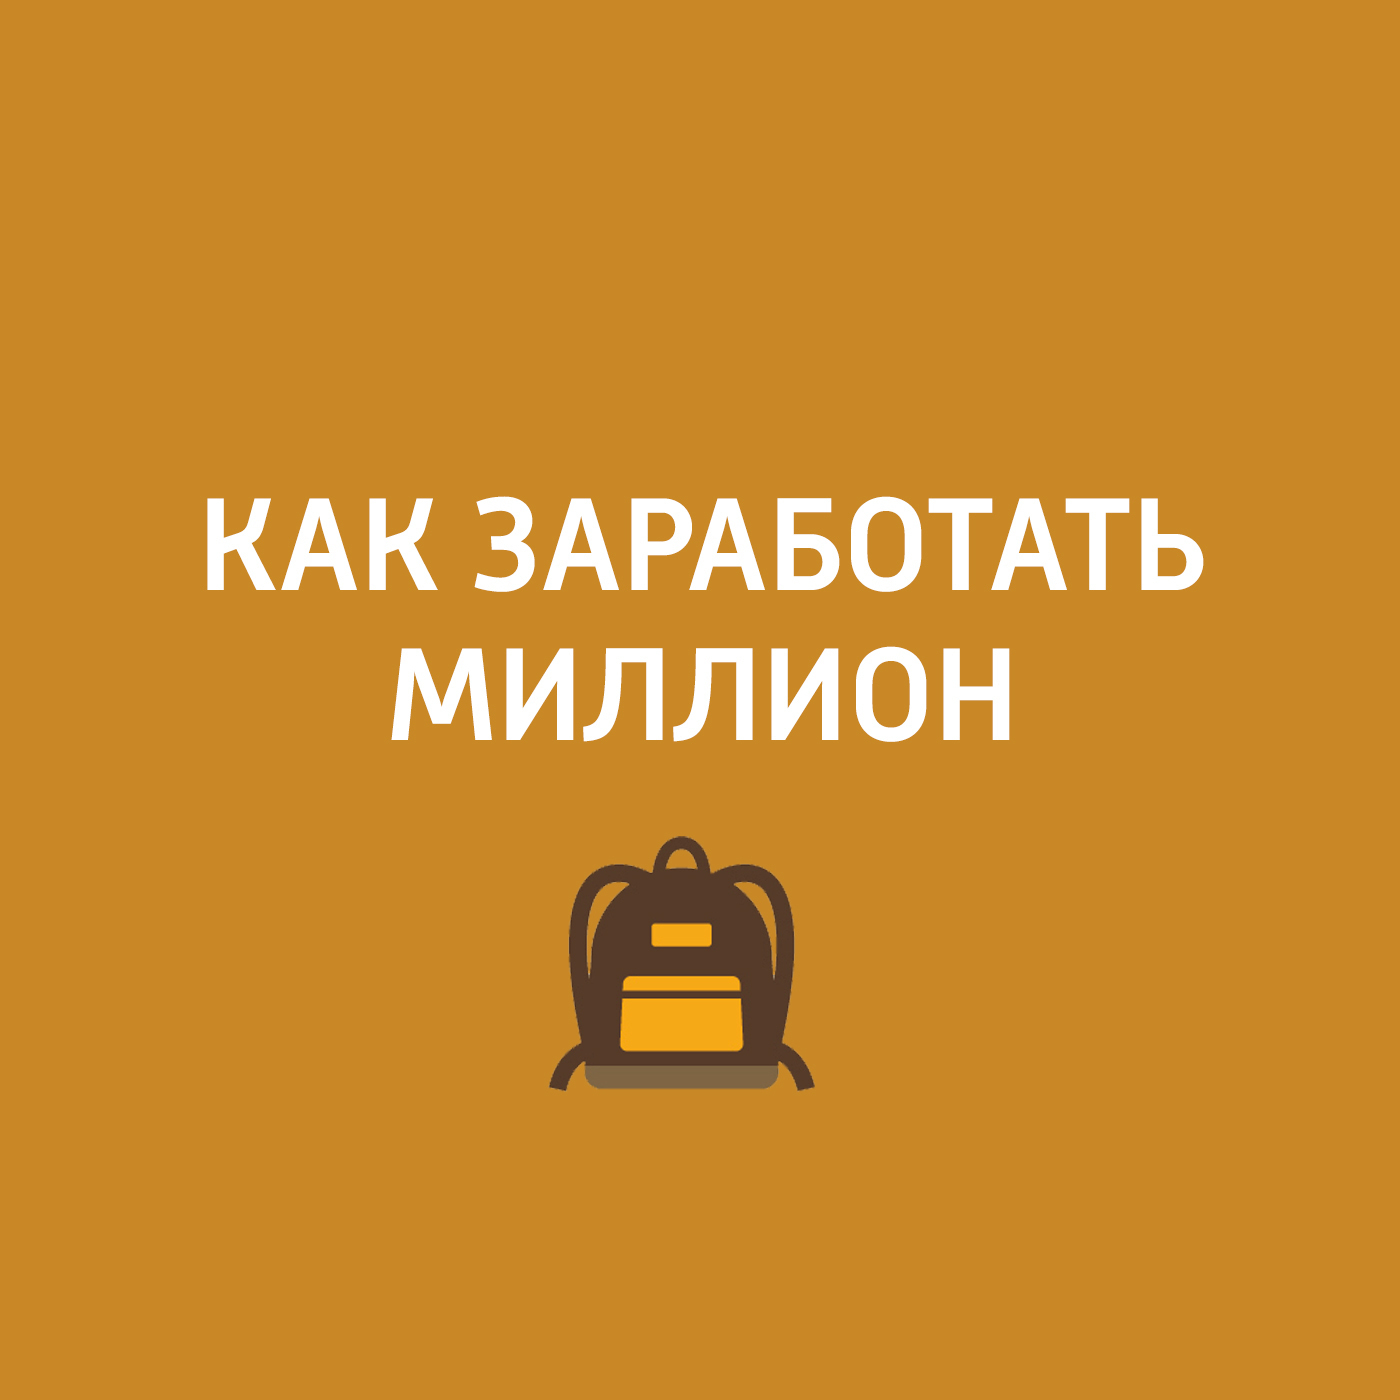 Творческий коллектив шоу «Сергей Стиллавин и его друзья» Like Lodka